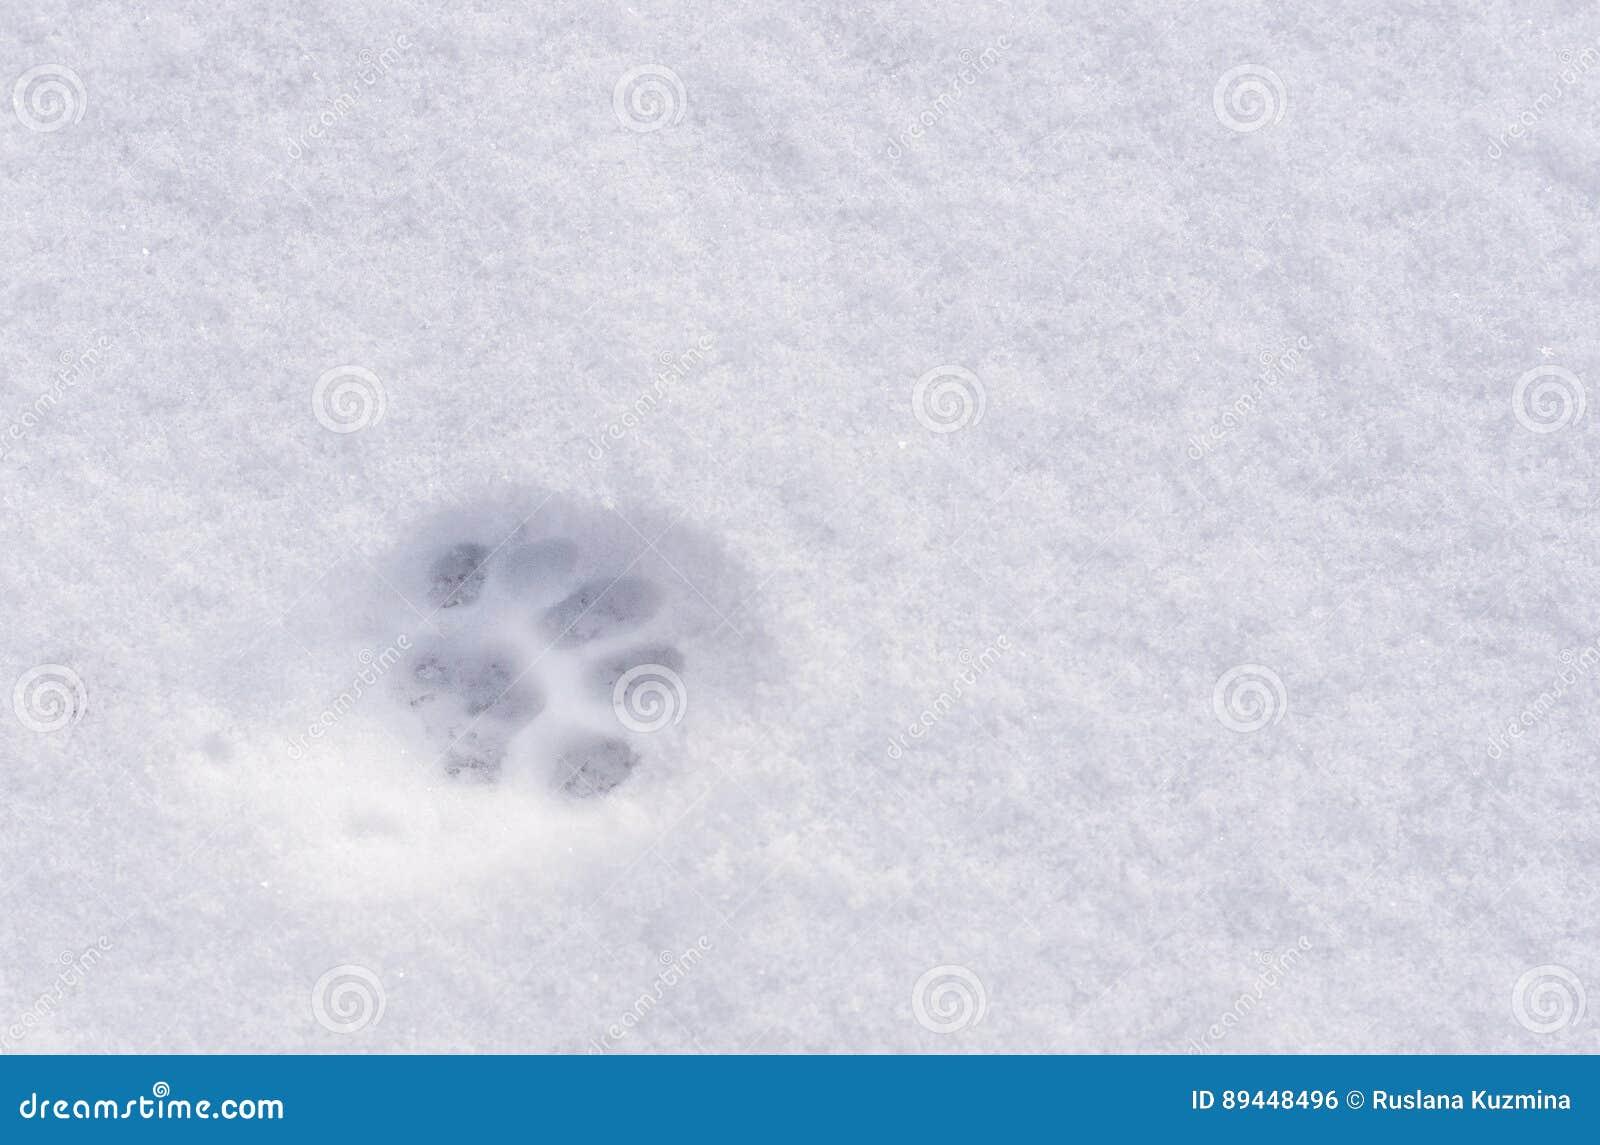 O Caminho pela neve - Página 2 Animal-footprint-snow-cat-dog-wolf-fox-89448496